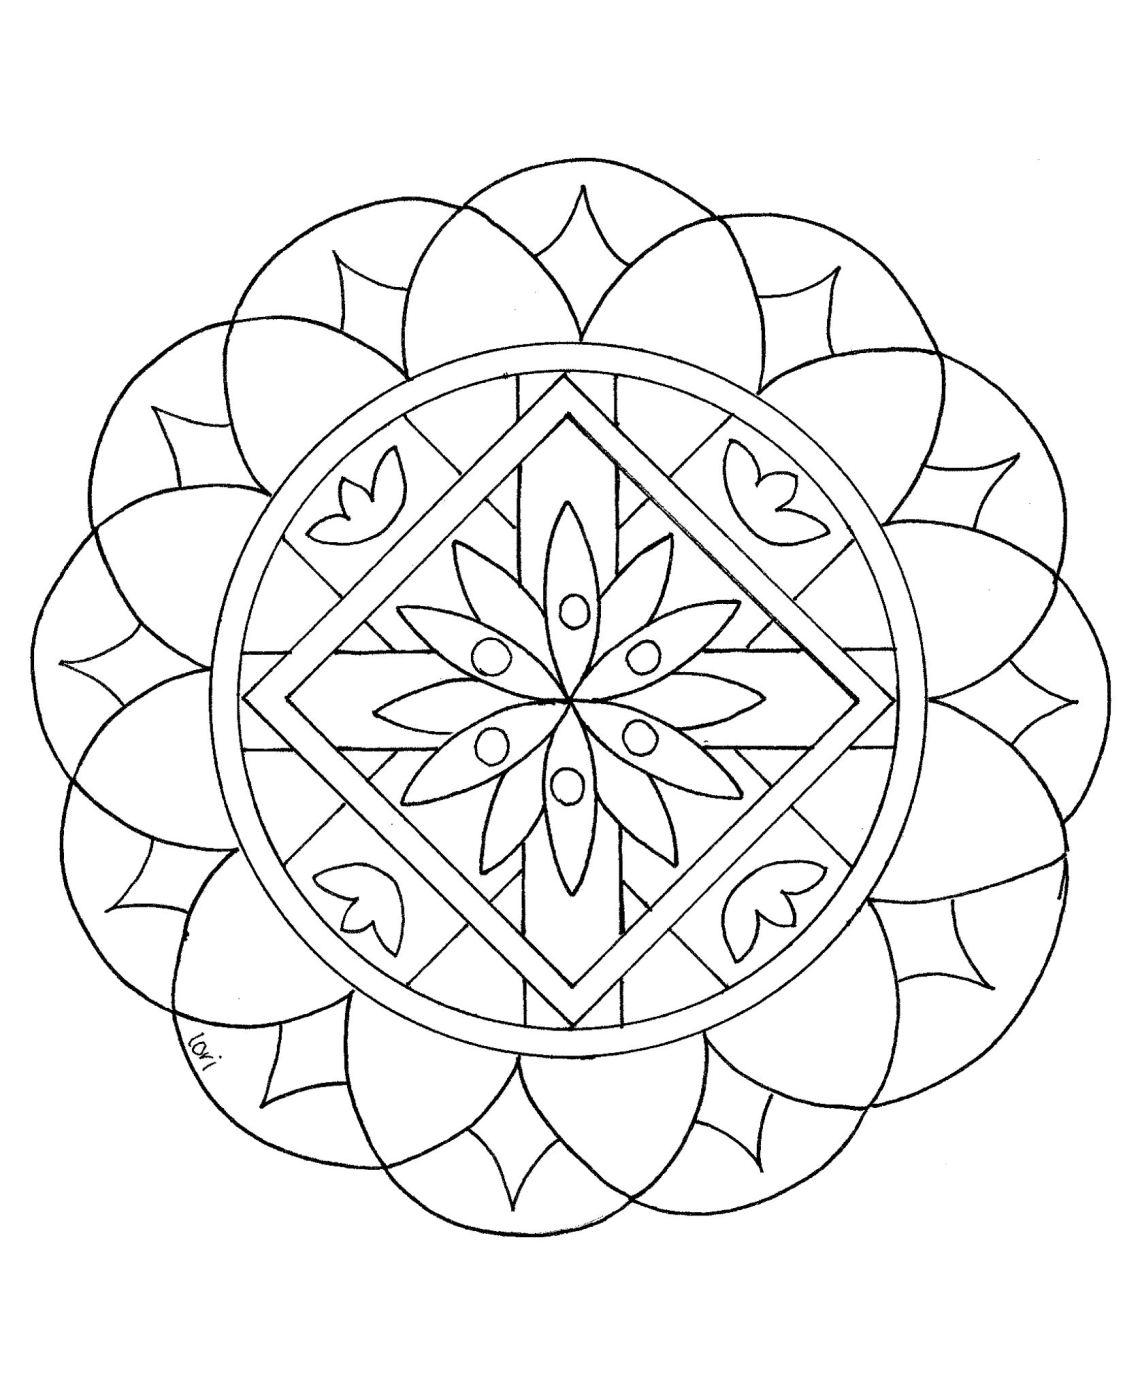 Great looking Mandala - Easy Mandalas for kids - 100% ...   free printable mandala coloring pages for adults easy